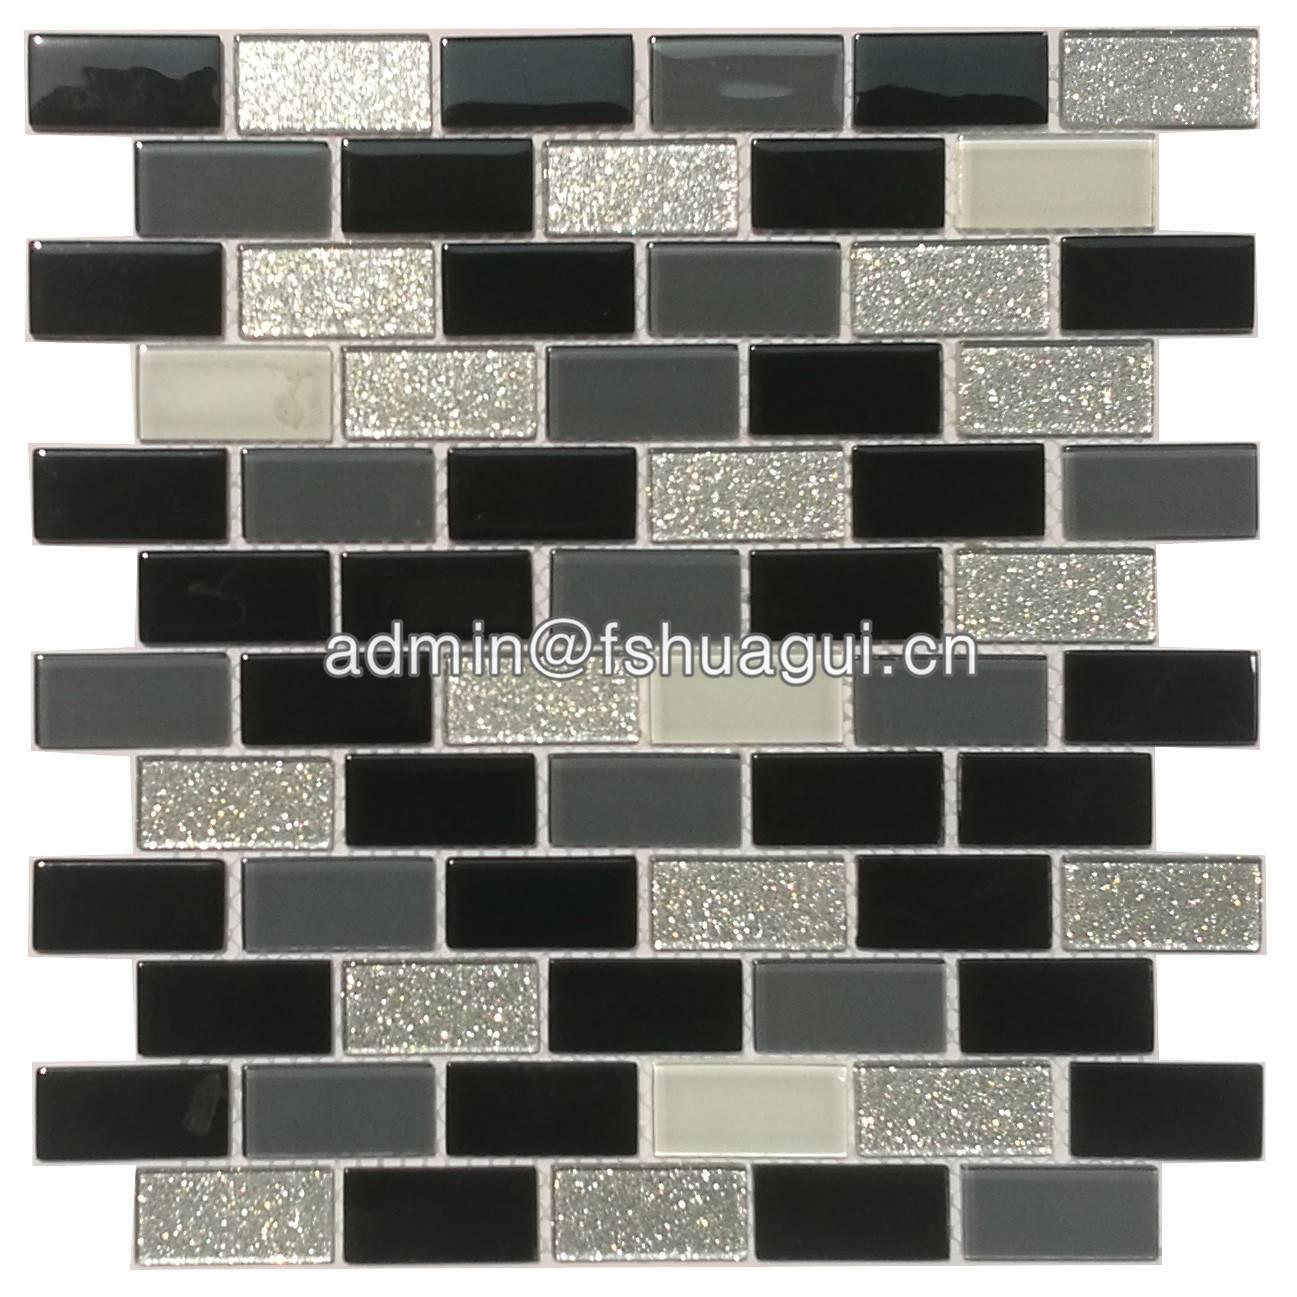 Huagui Silver black and white glass mosaic tile for kitchen backsplash HG-15-17 GLASS MOSAIC TILE image6